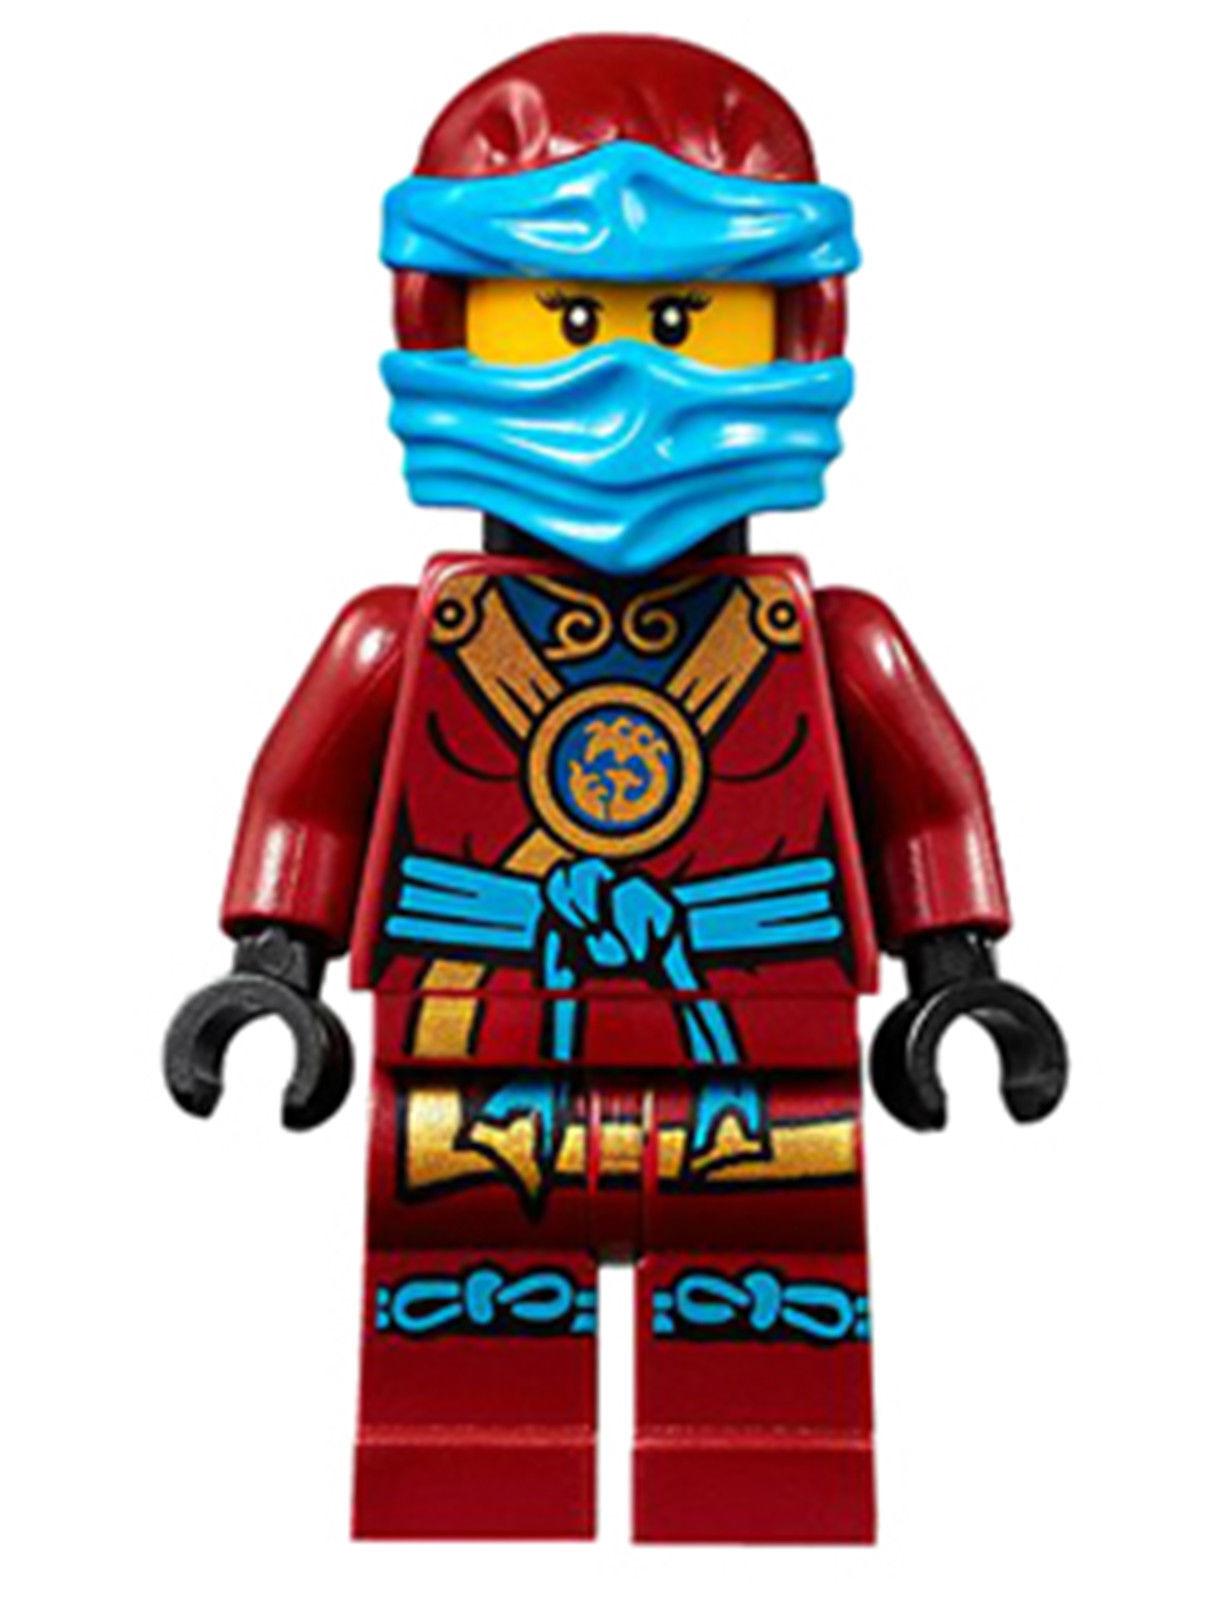 LEGO Ninjago Ninja Minifigures Vintage Great Condition Choose your figure!